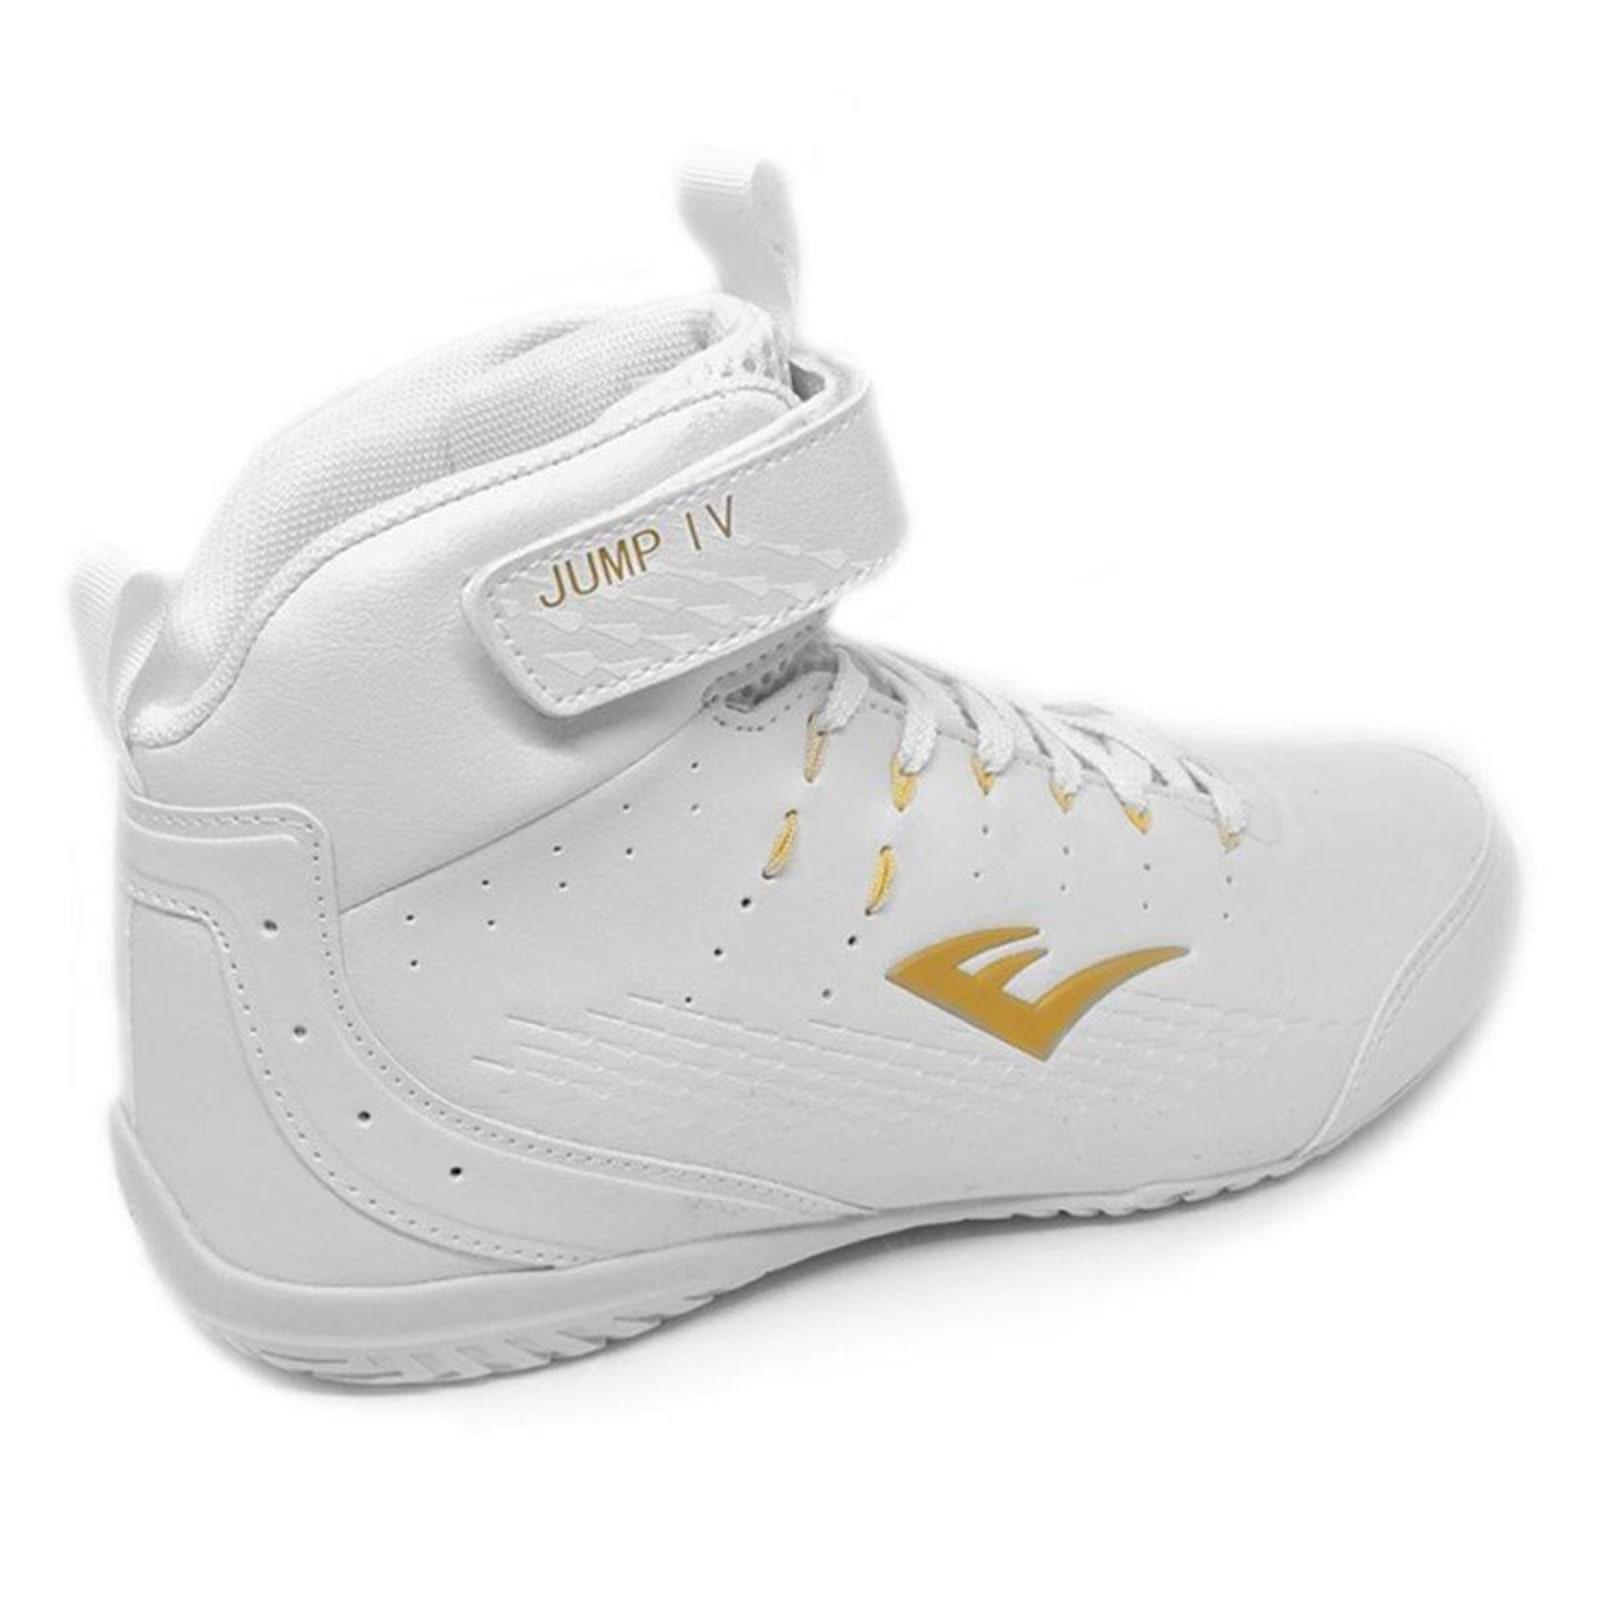 Tênis Everlast Jump IV Branco e Dourado  - Vitta Gold